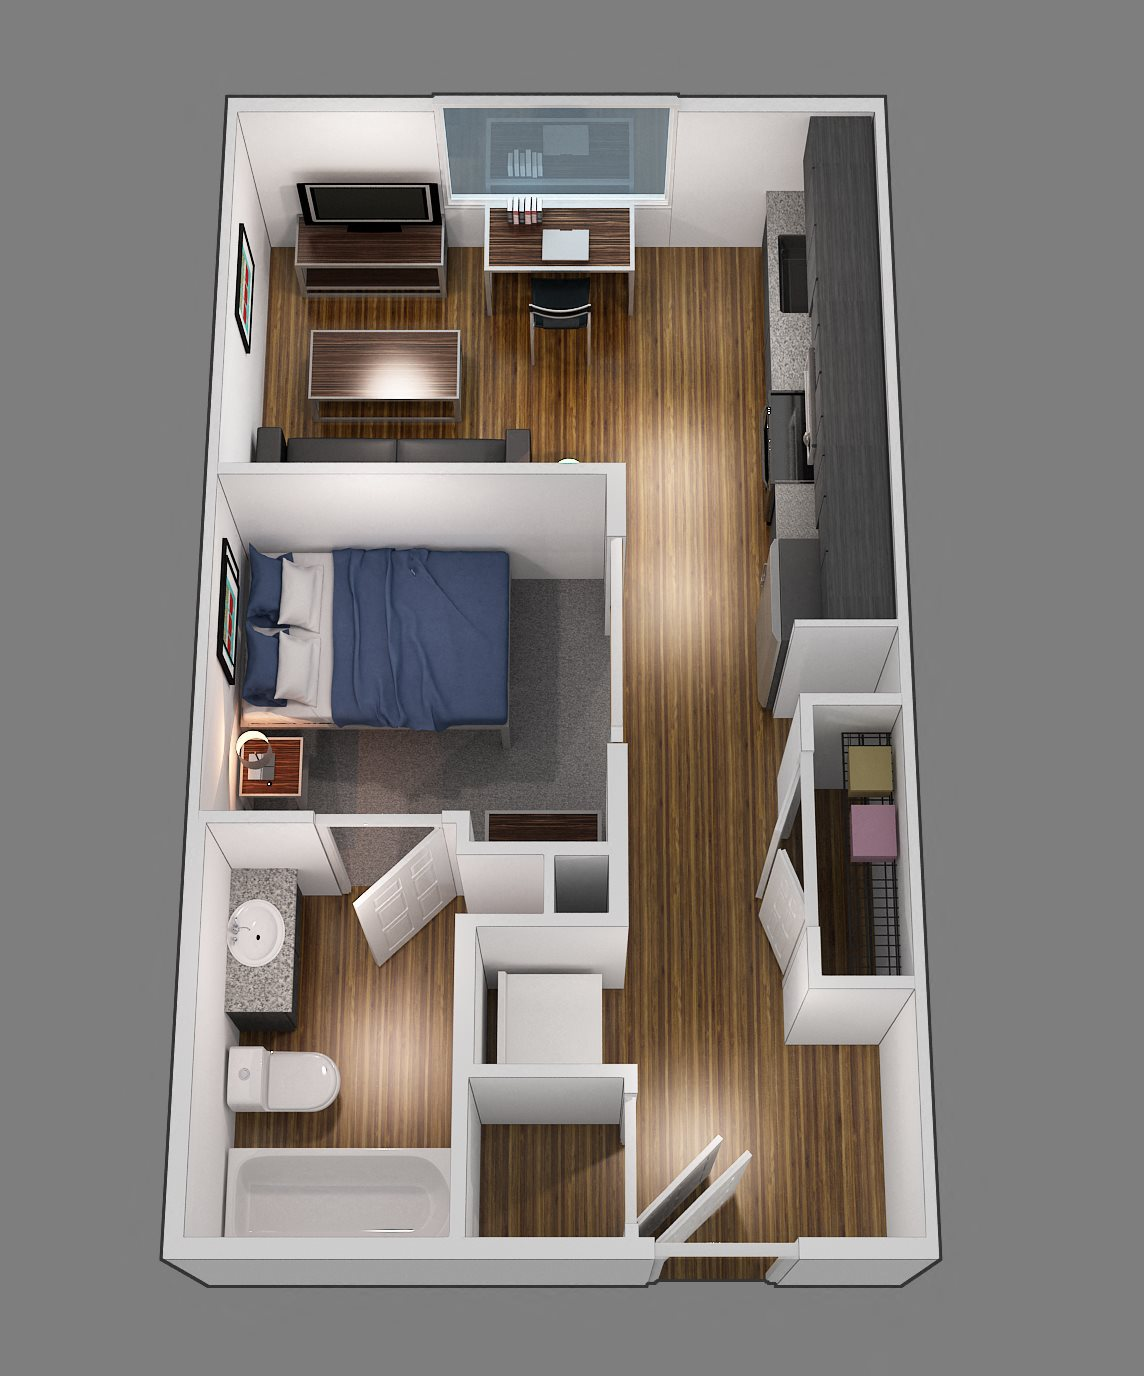 floor plans of park place at waco in waco tx studio floor plan 1